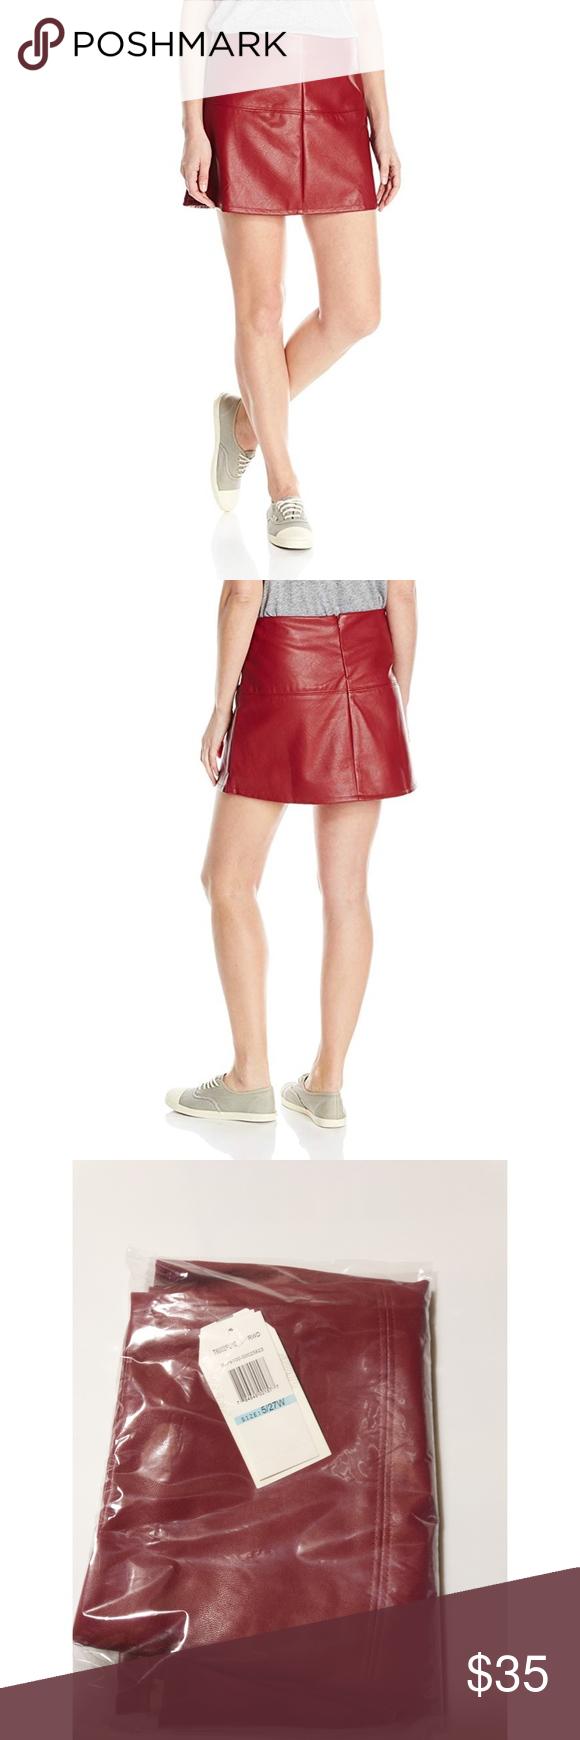 7cc2278f6 Jolt Womans egan Leather Mini Short Seam Skirt NWT Jolt Womans Size 5  Redwood Red Vegan